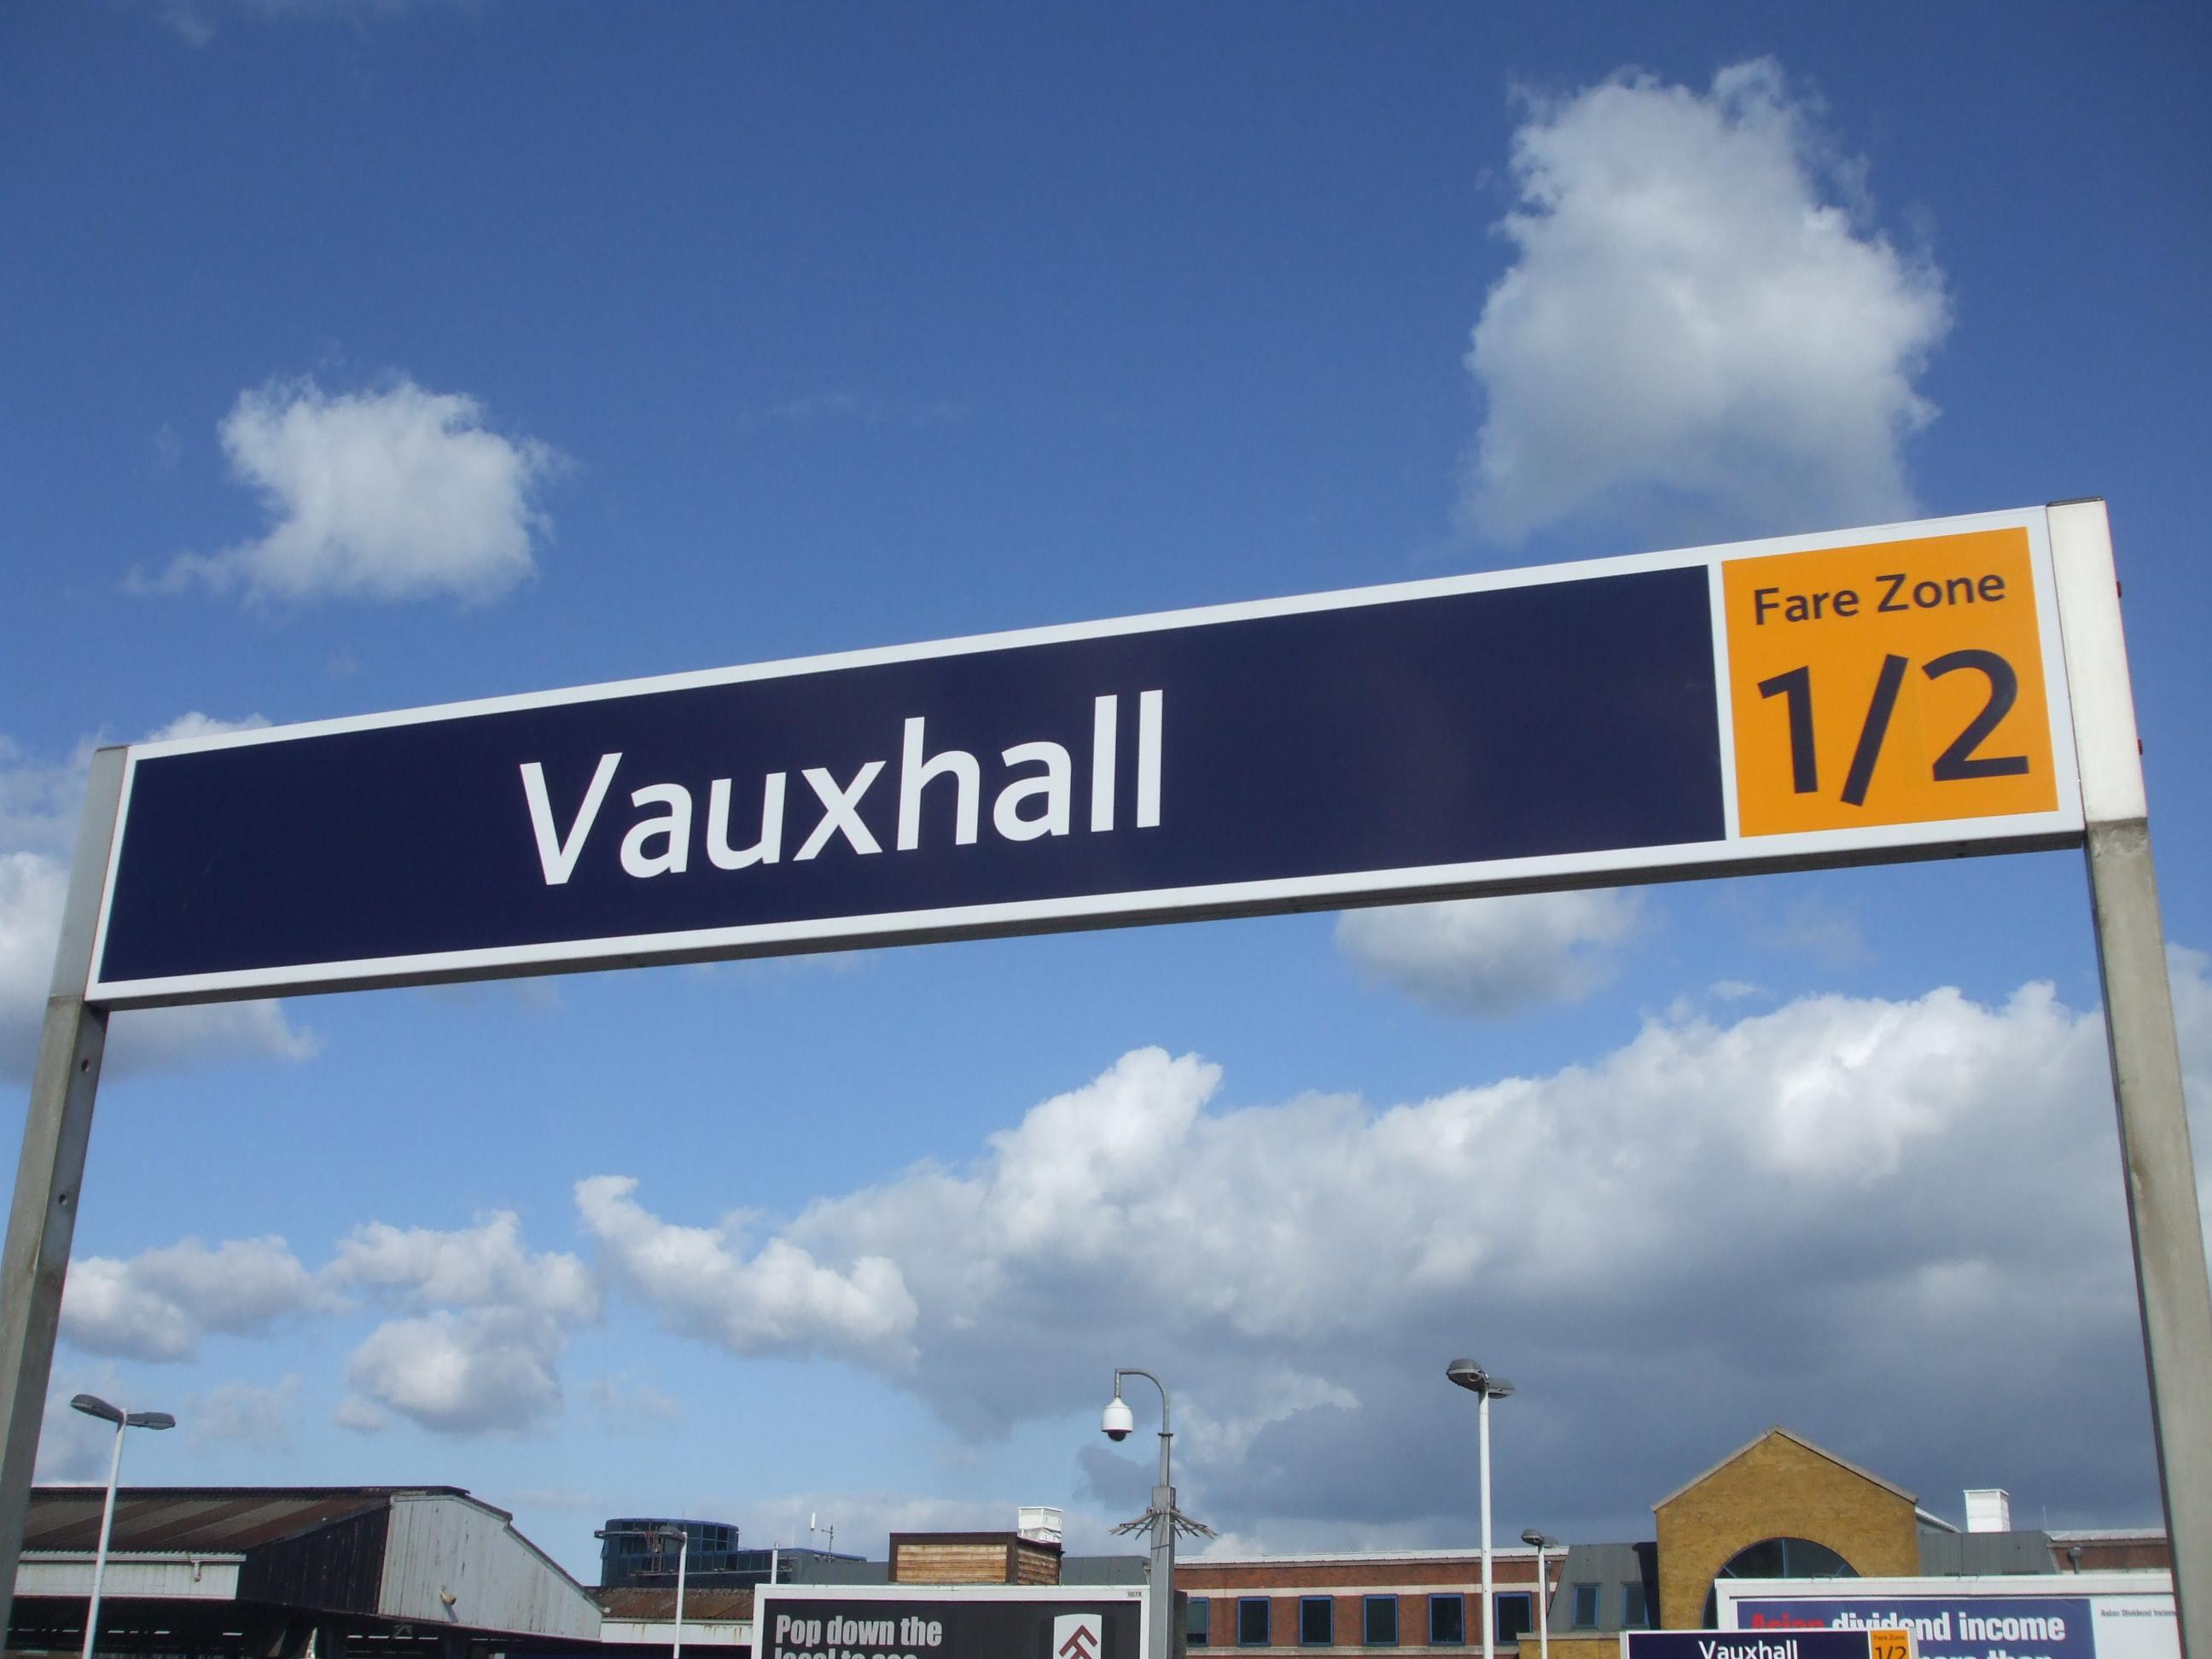 Vauxhall_station_mainline_signage_2010.JPG